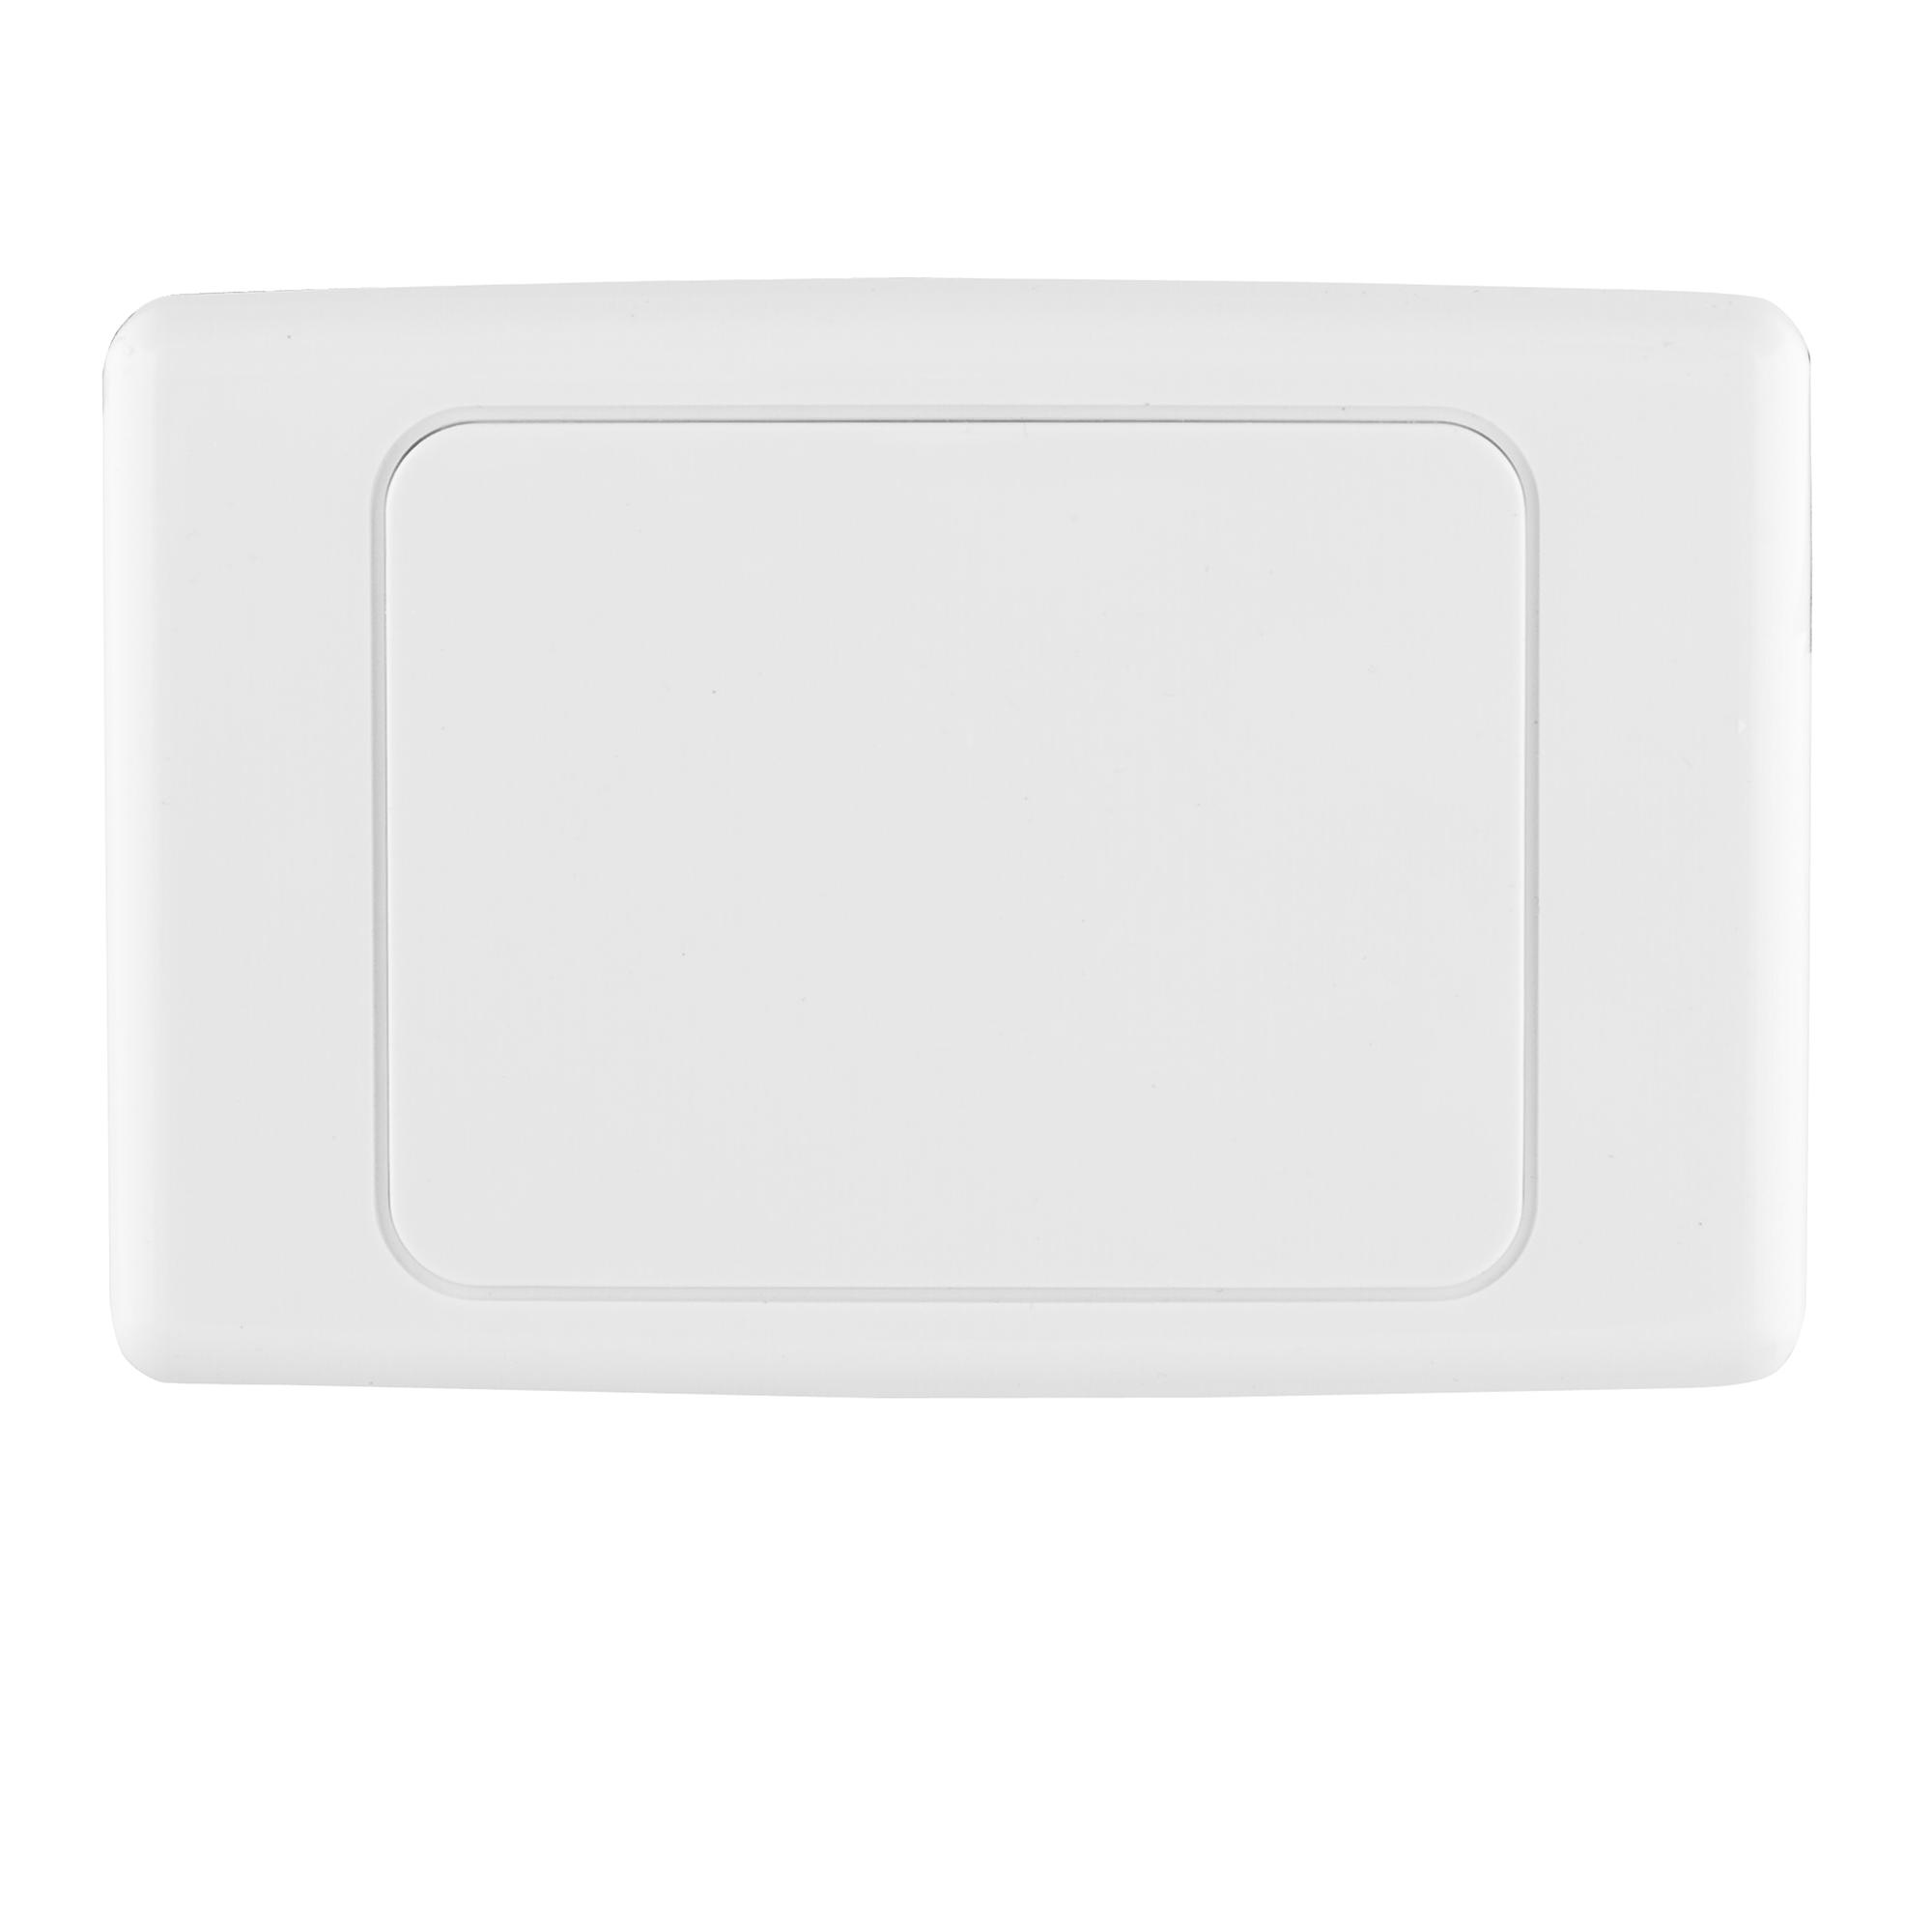 Deta blank wall cover plate